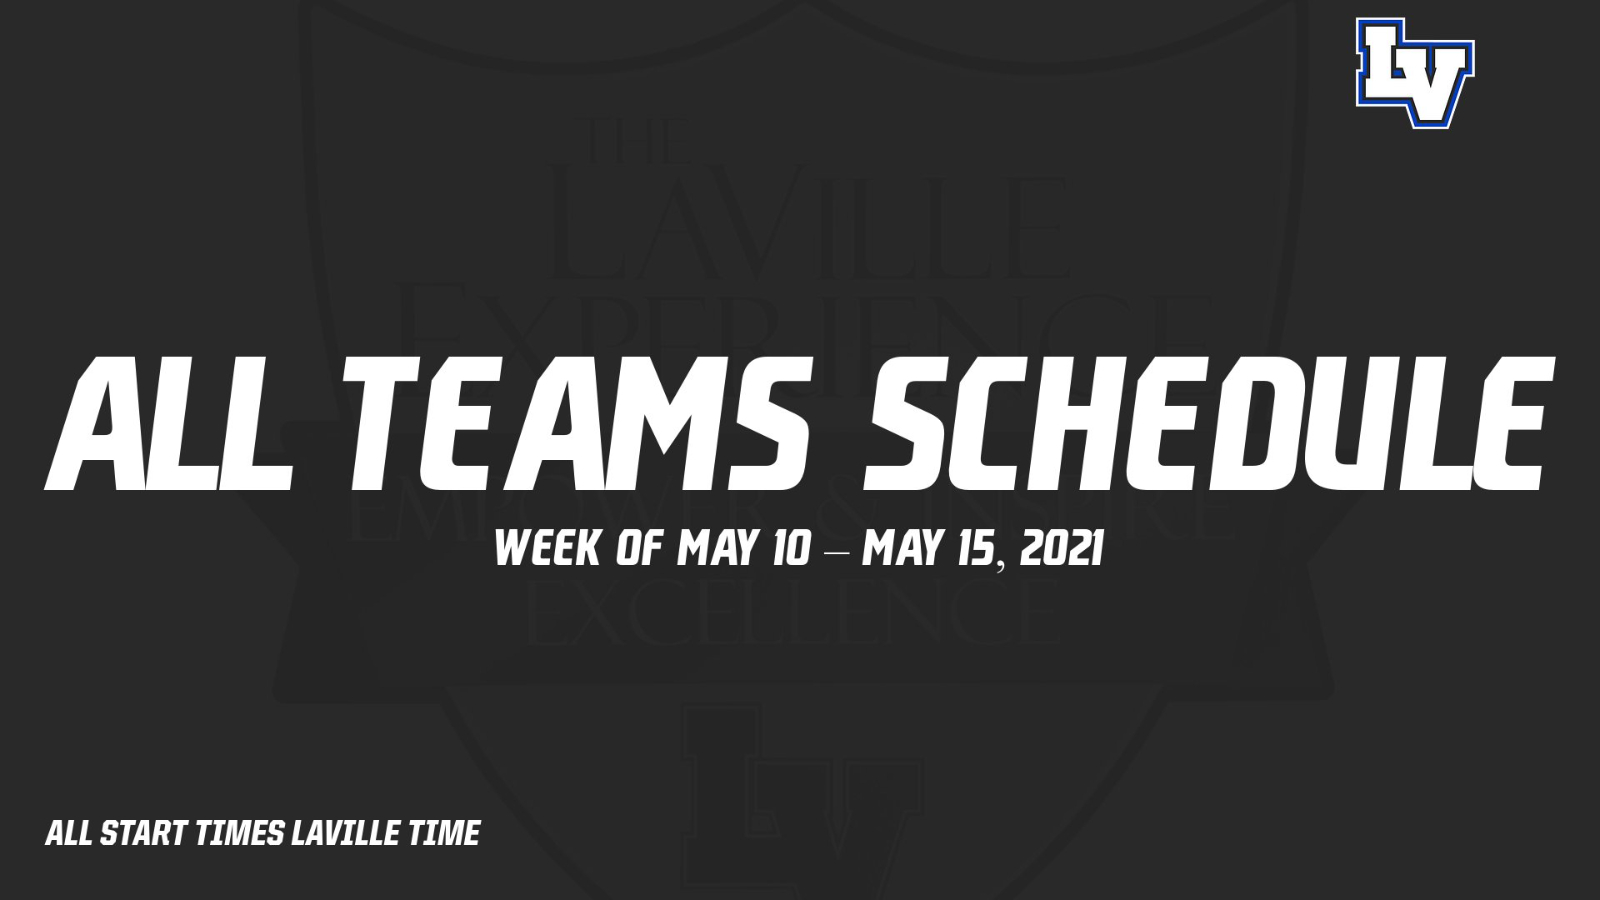 All Teams Schedule: Week of May 10 – May 15